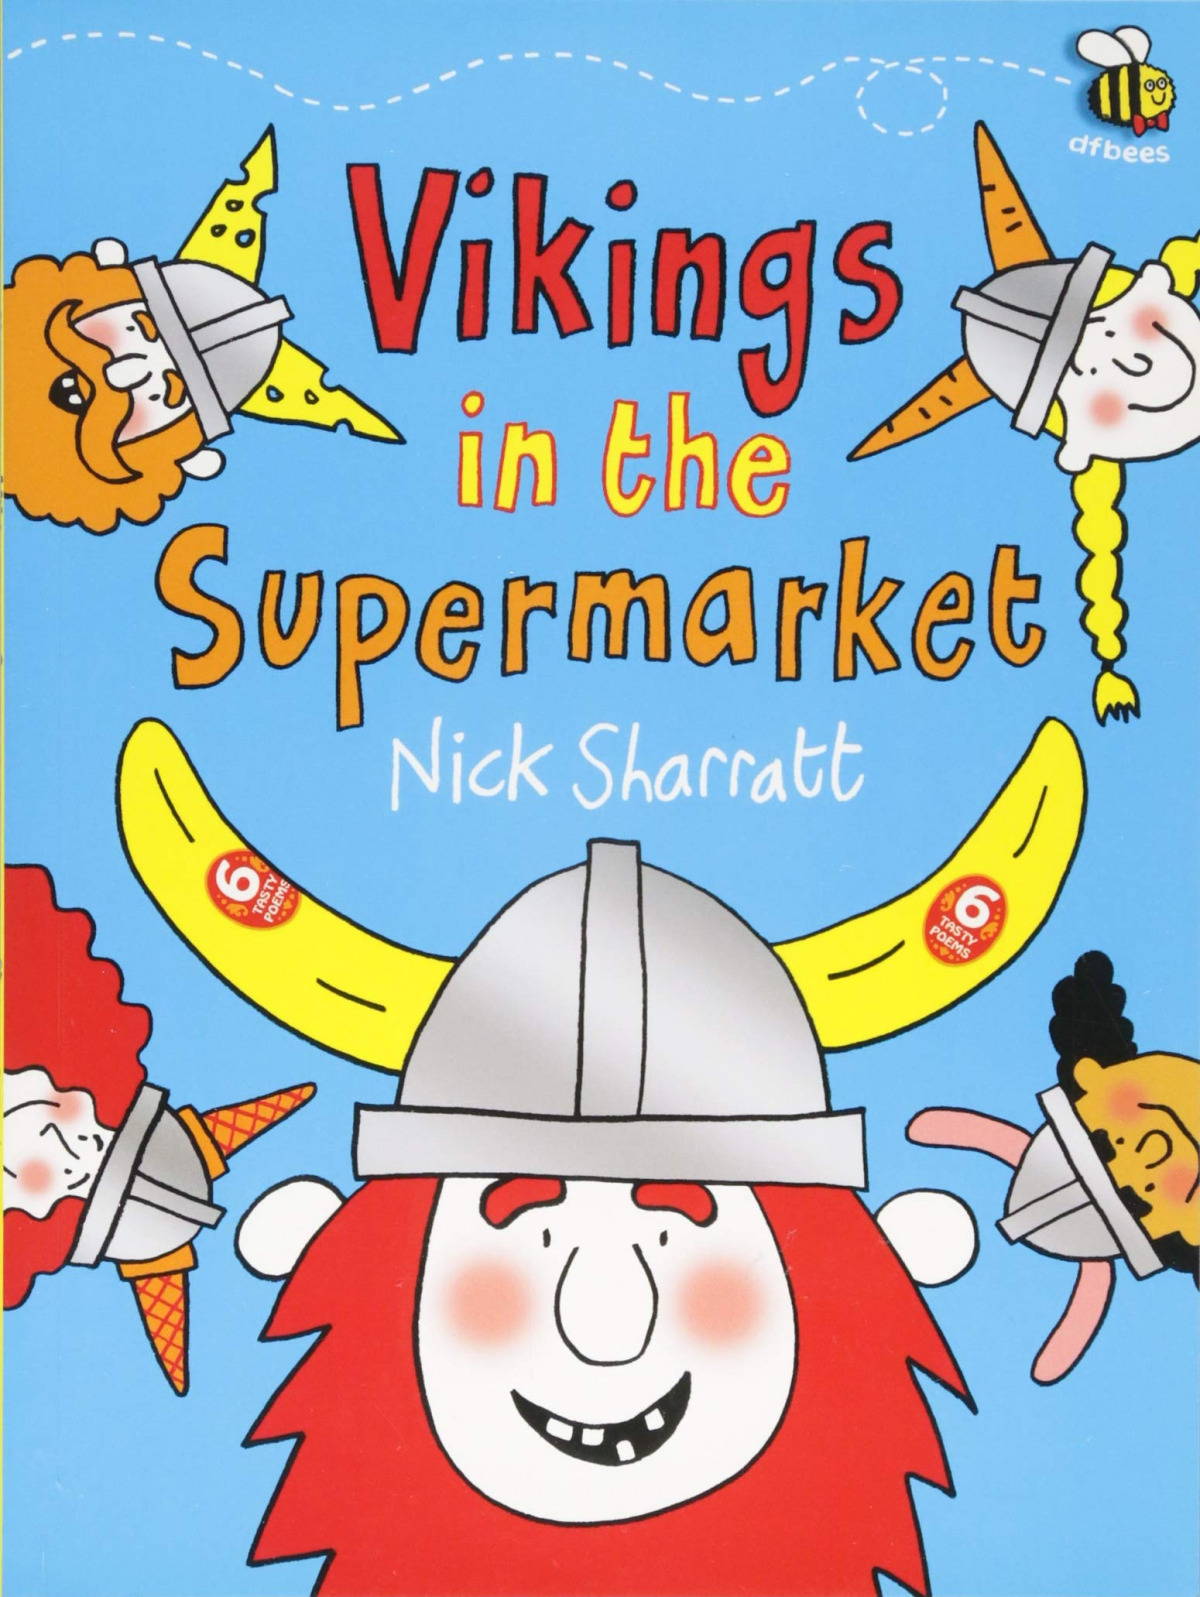 (sharratt).vikings in he supermarket